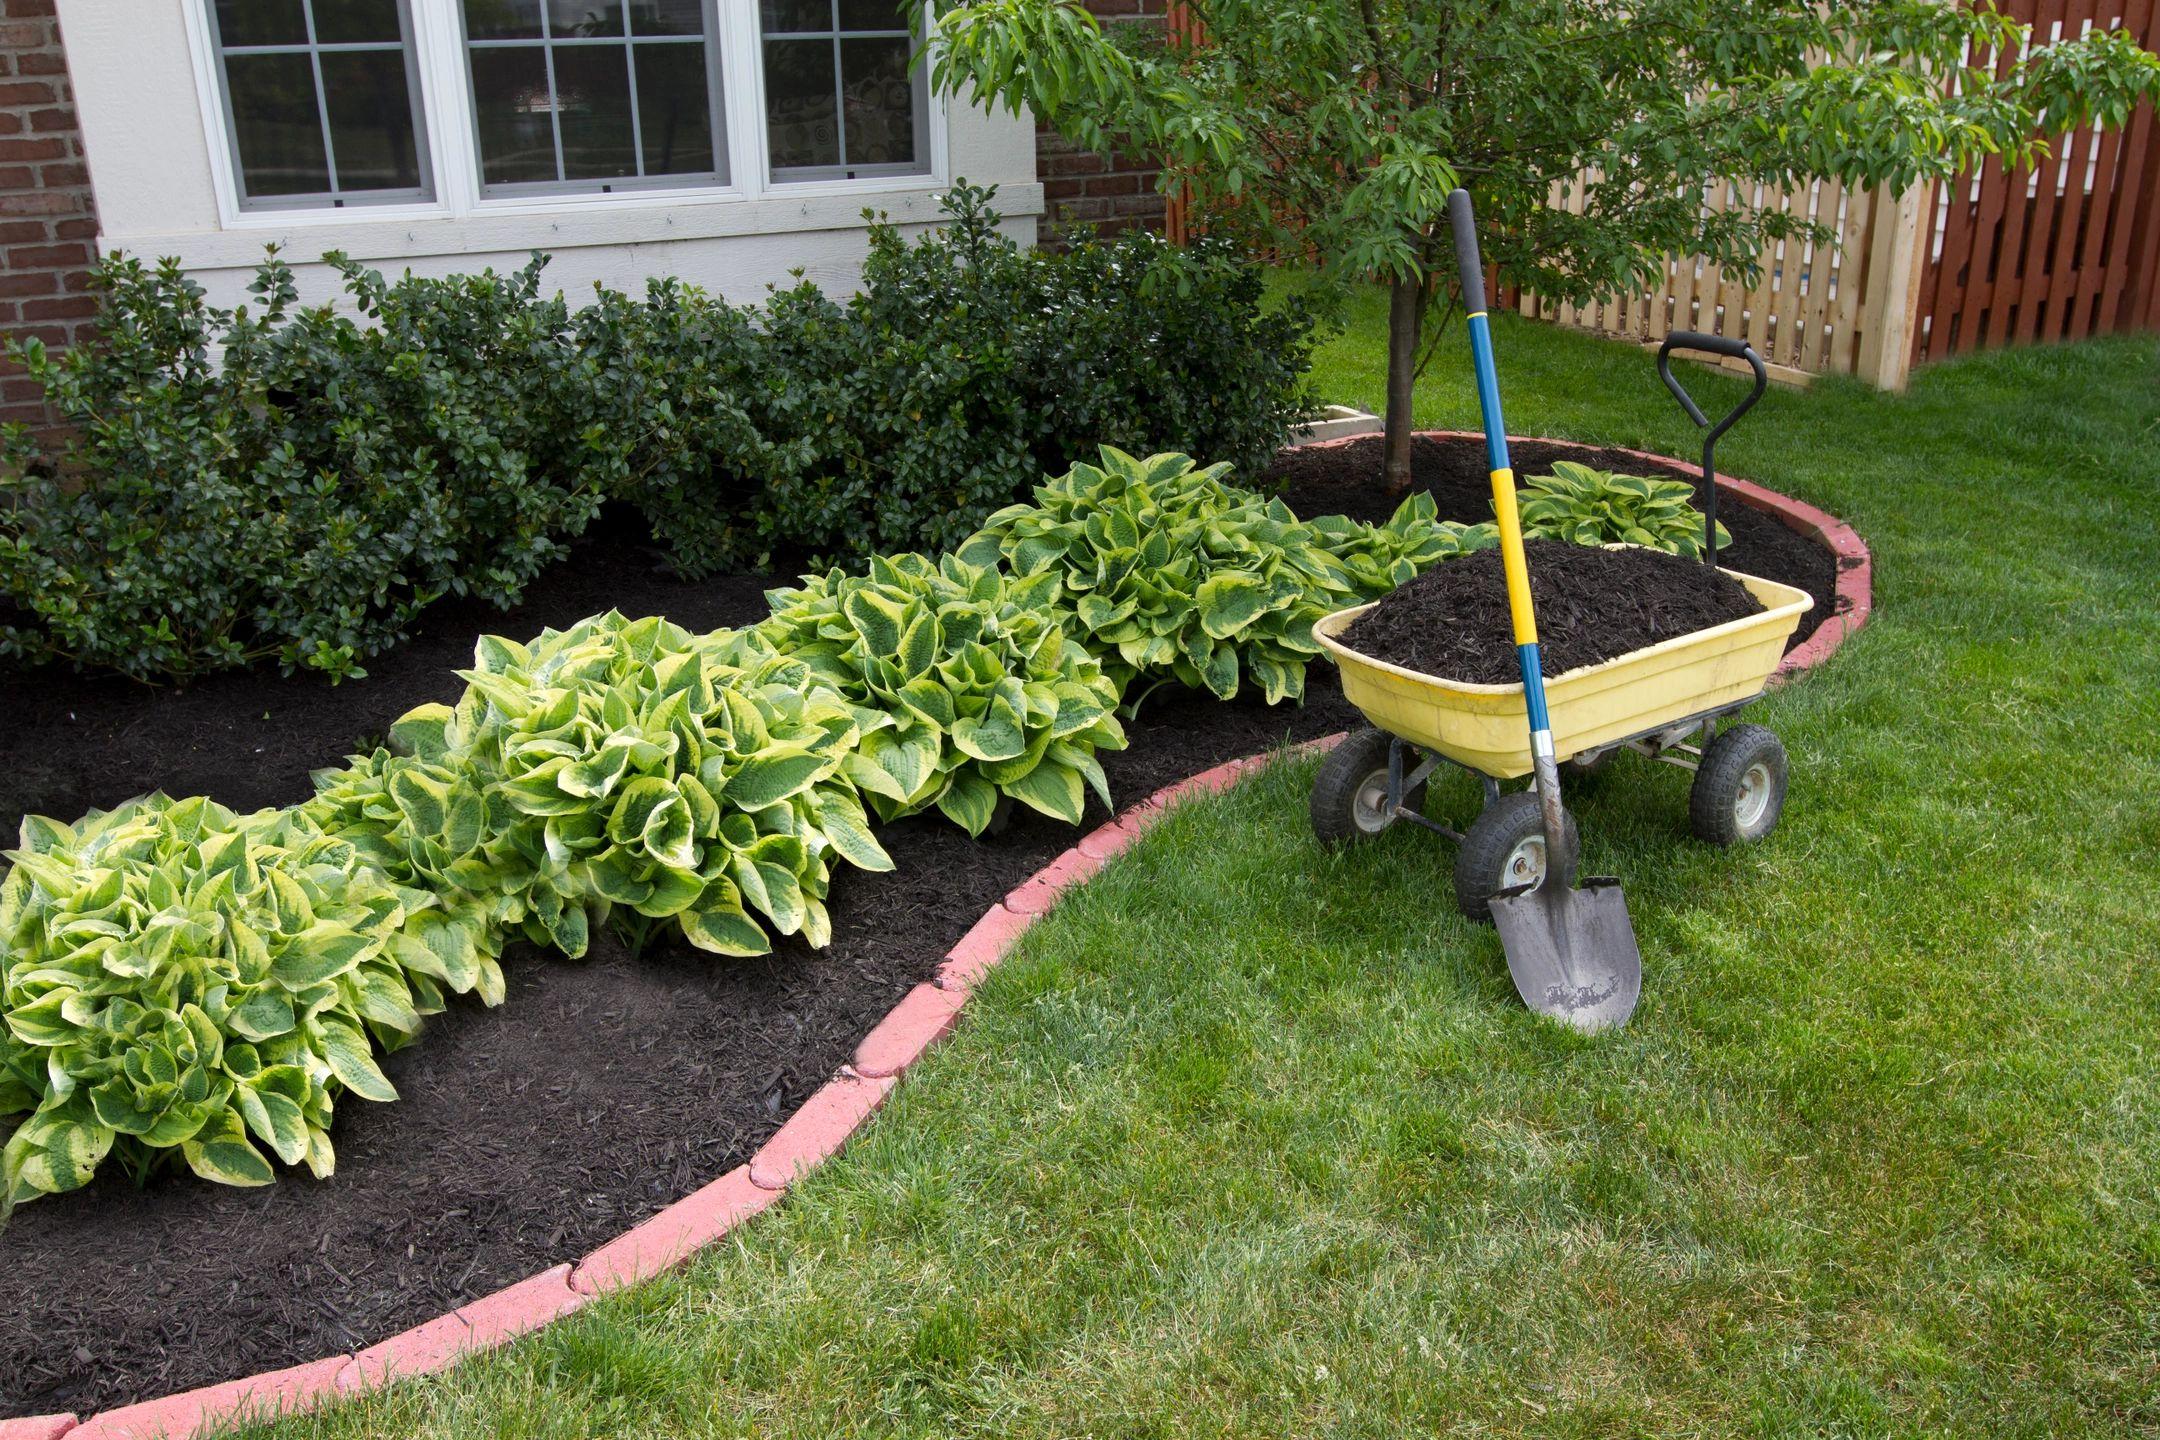 Landscaping-Mulching-Planting